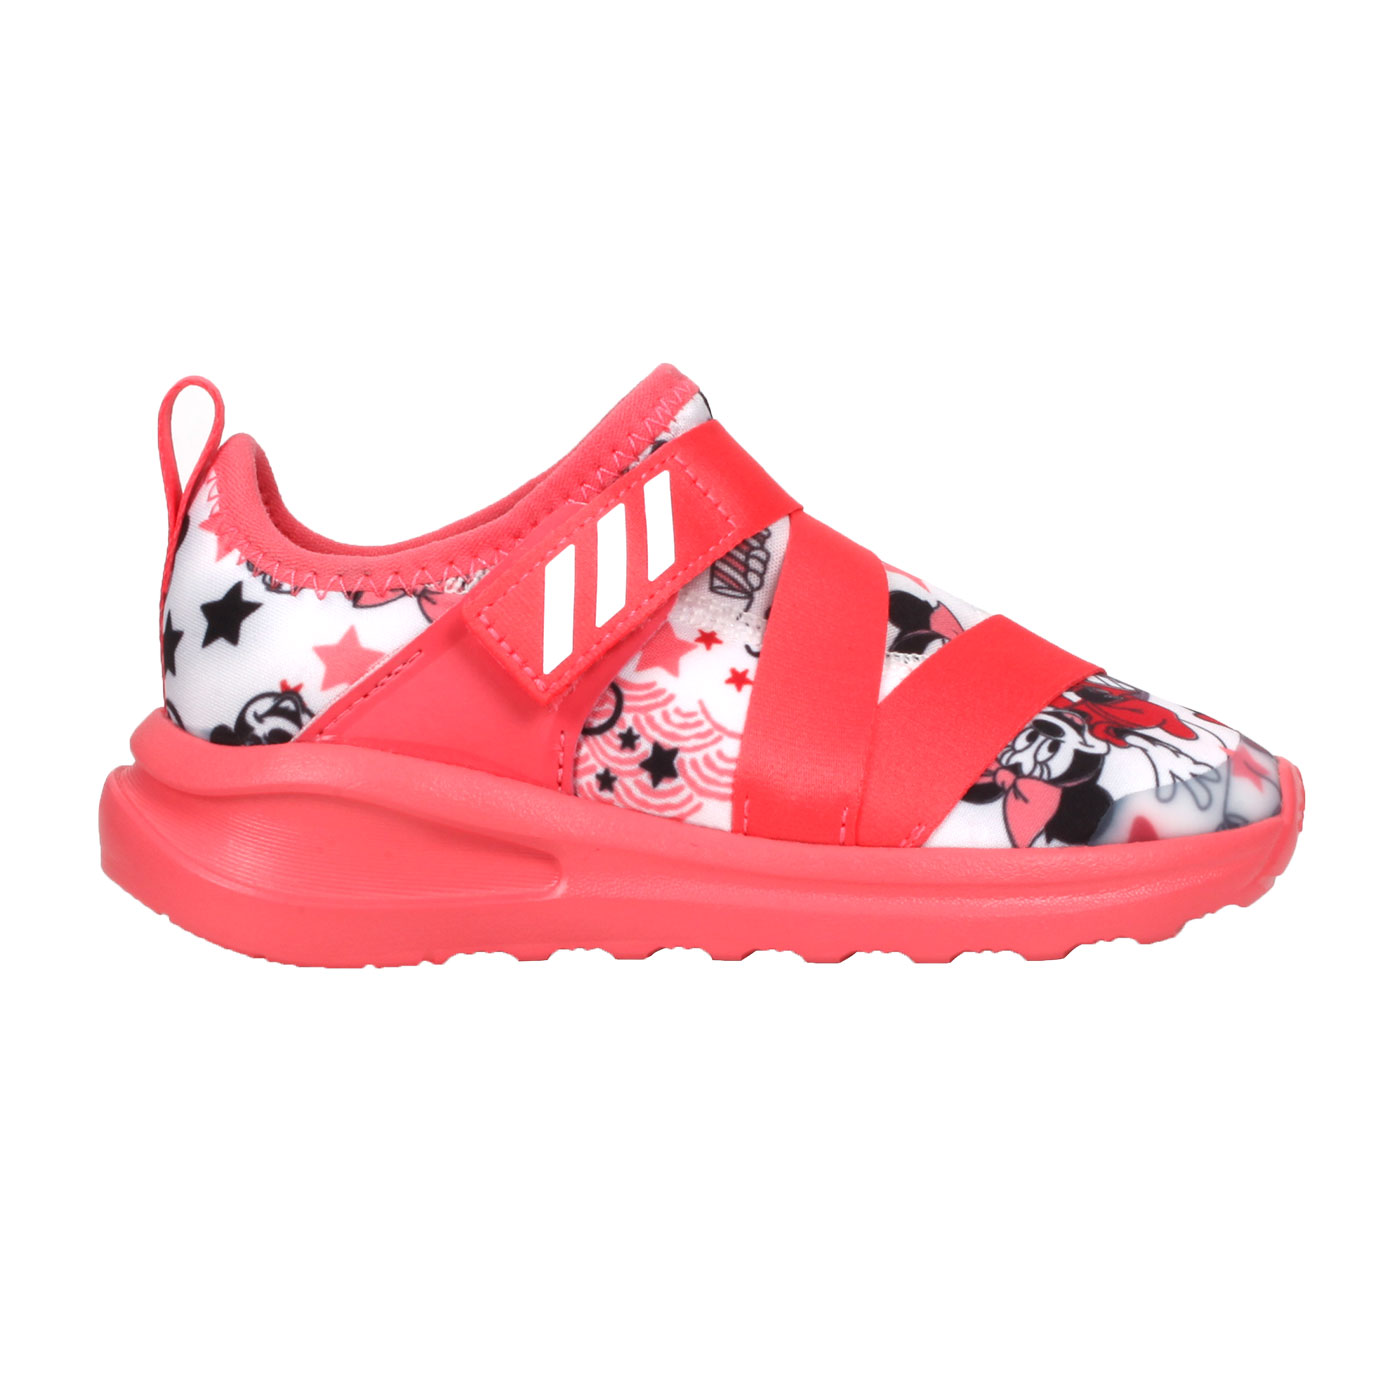 ADIDAS 小童休閒運動鞋  @FortaRun X Minnie I@FV4260 - 珊瑚紅白黑